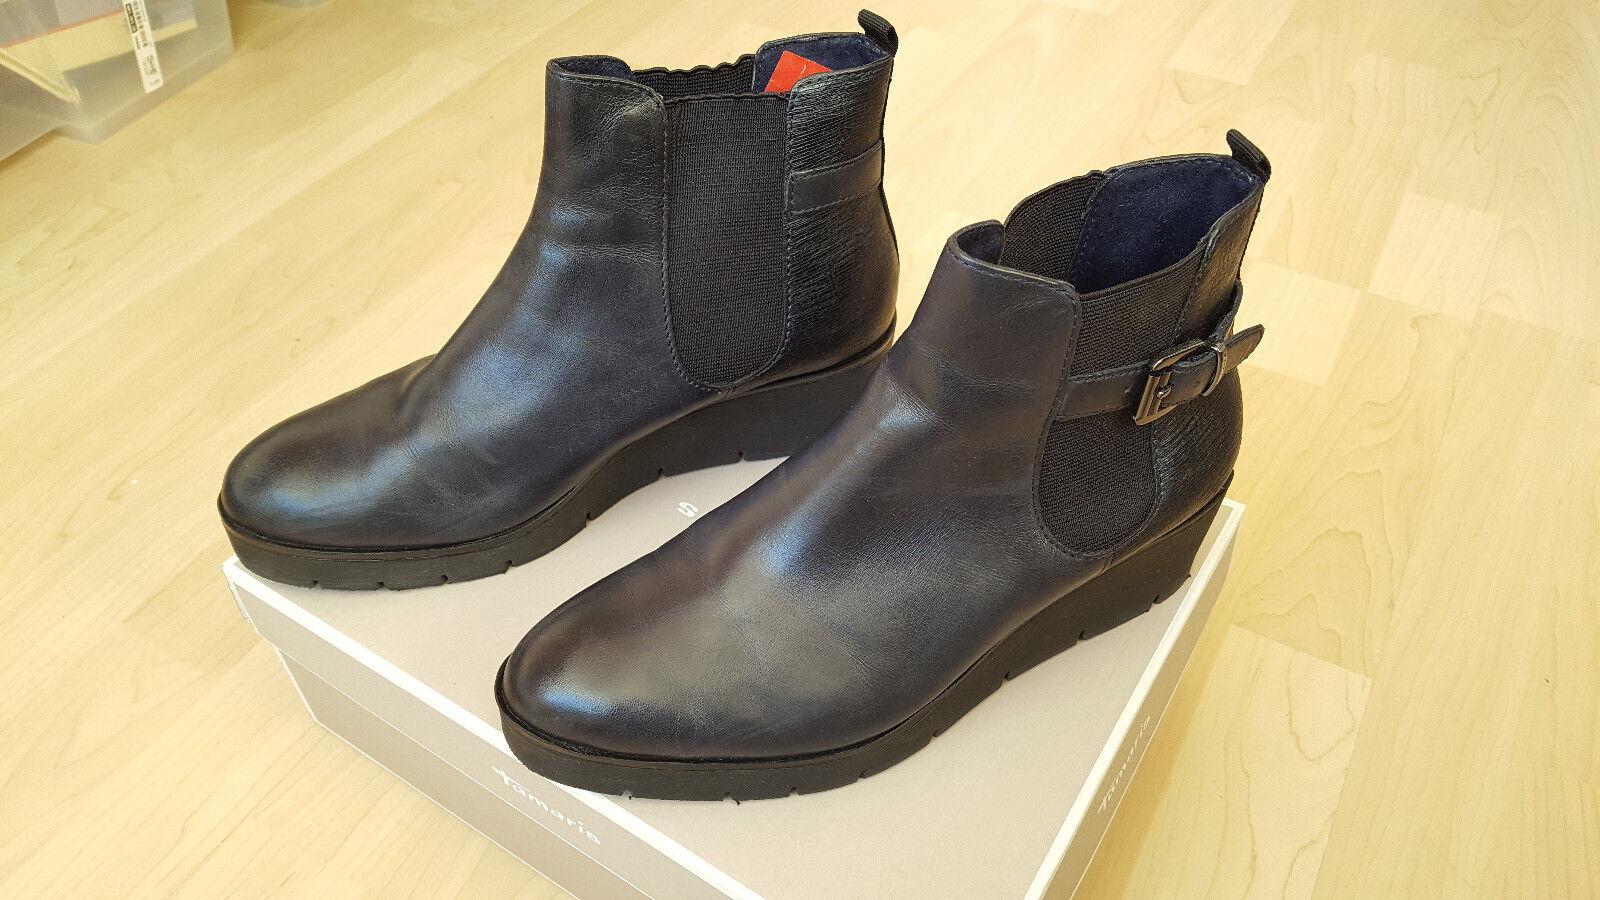 TAMARIS SEHR Damen Leder 38 Schuhe Stiefeletten Gr. 38 Leder SEHR TAMARIS GUT ... 9102da